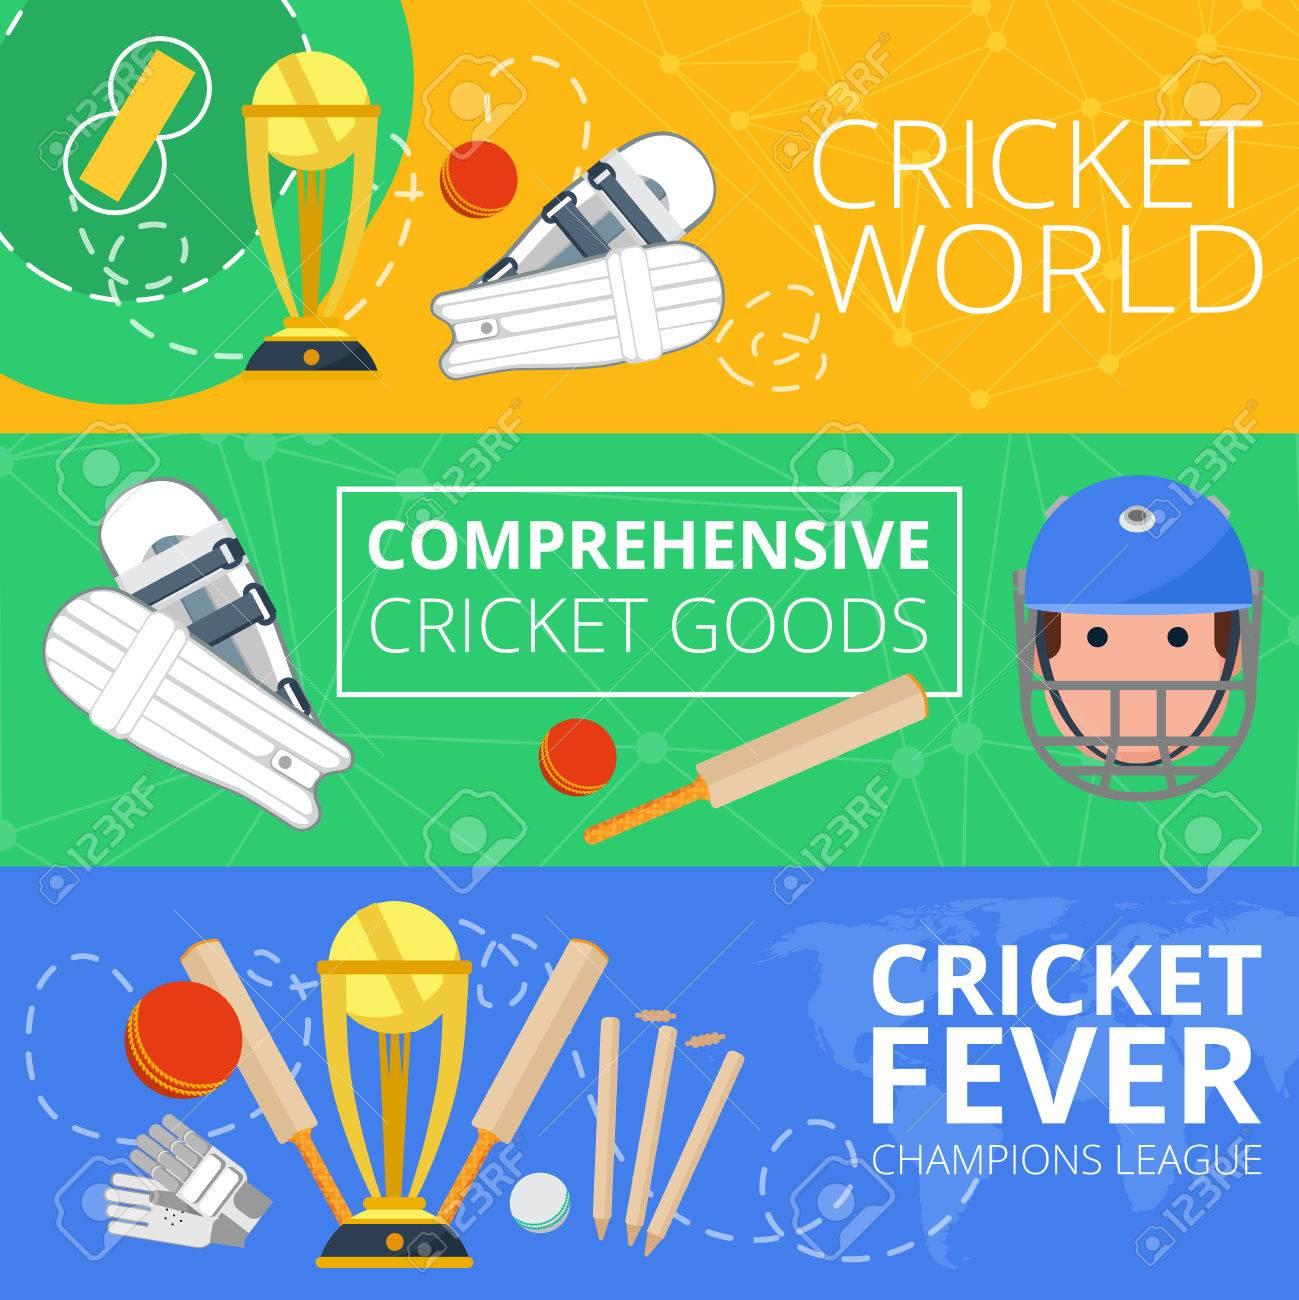 Champions League Cricket World Goods Symbols Flat Banners Set